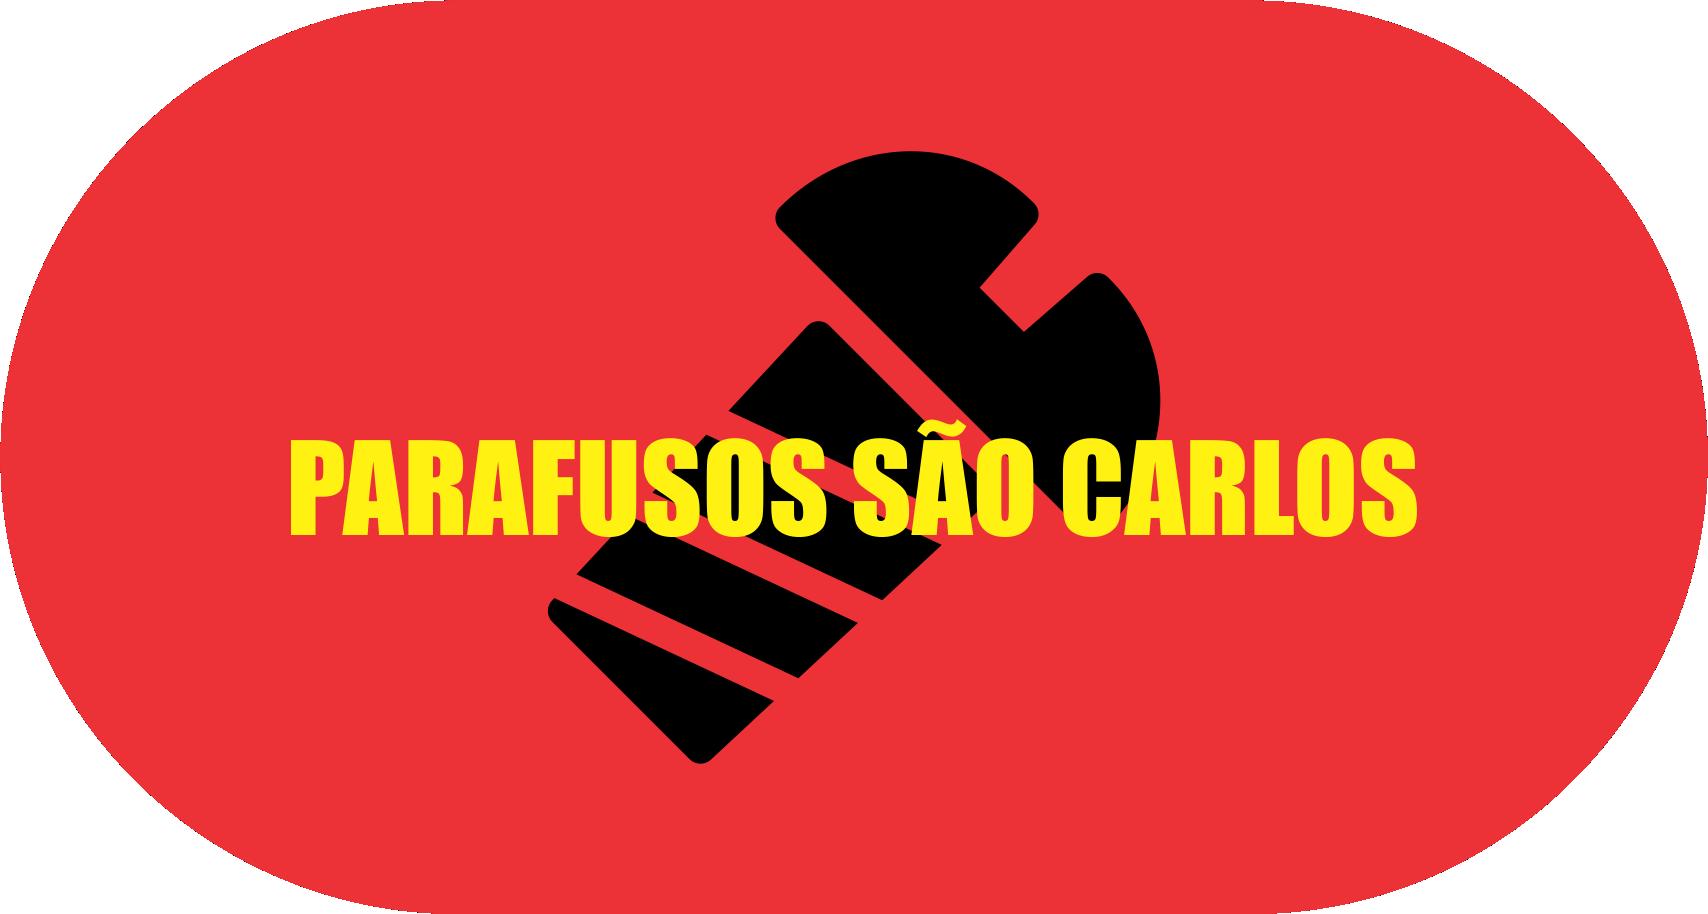 Parafusos São Carlos